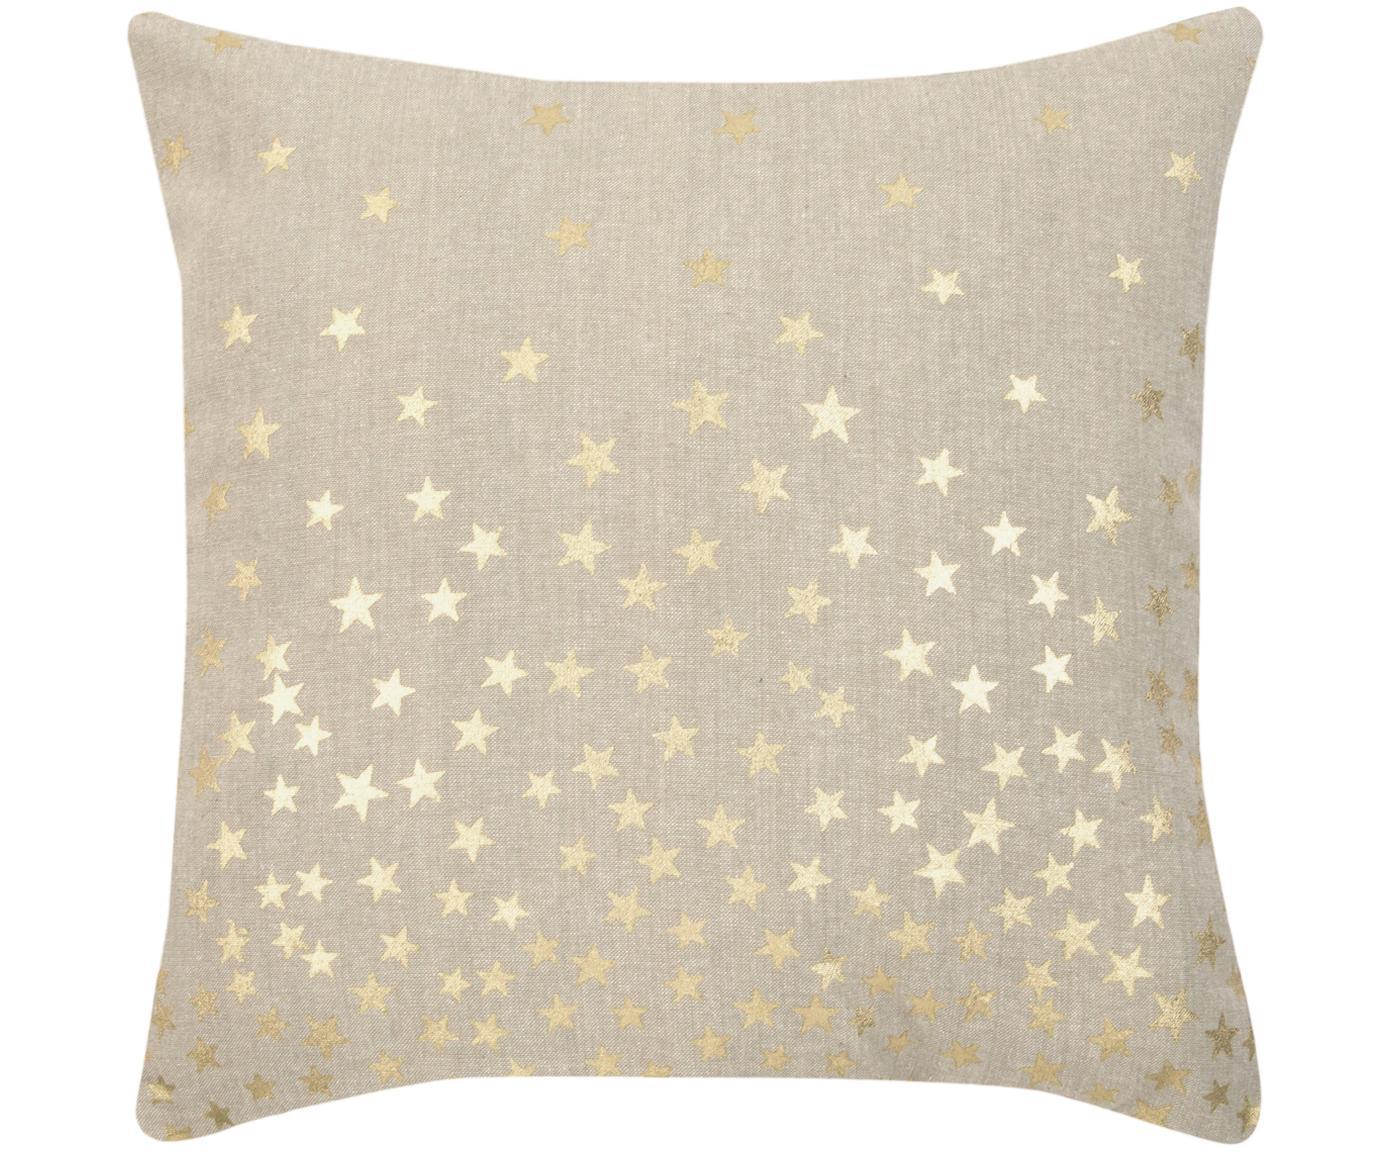 Funda de cojín Goldstar, 100%algodón, Beige, dorado, An 45 x L 45 cm